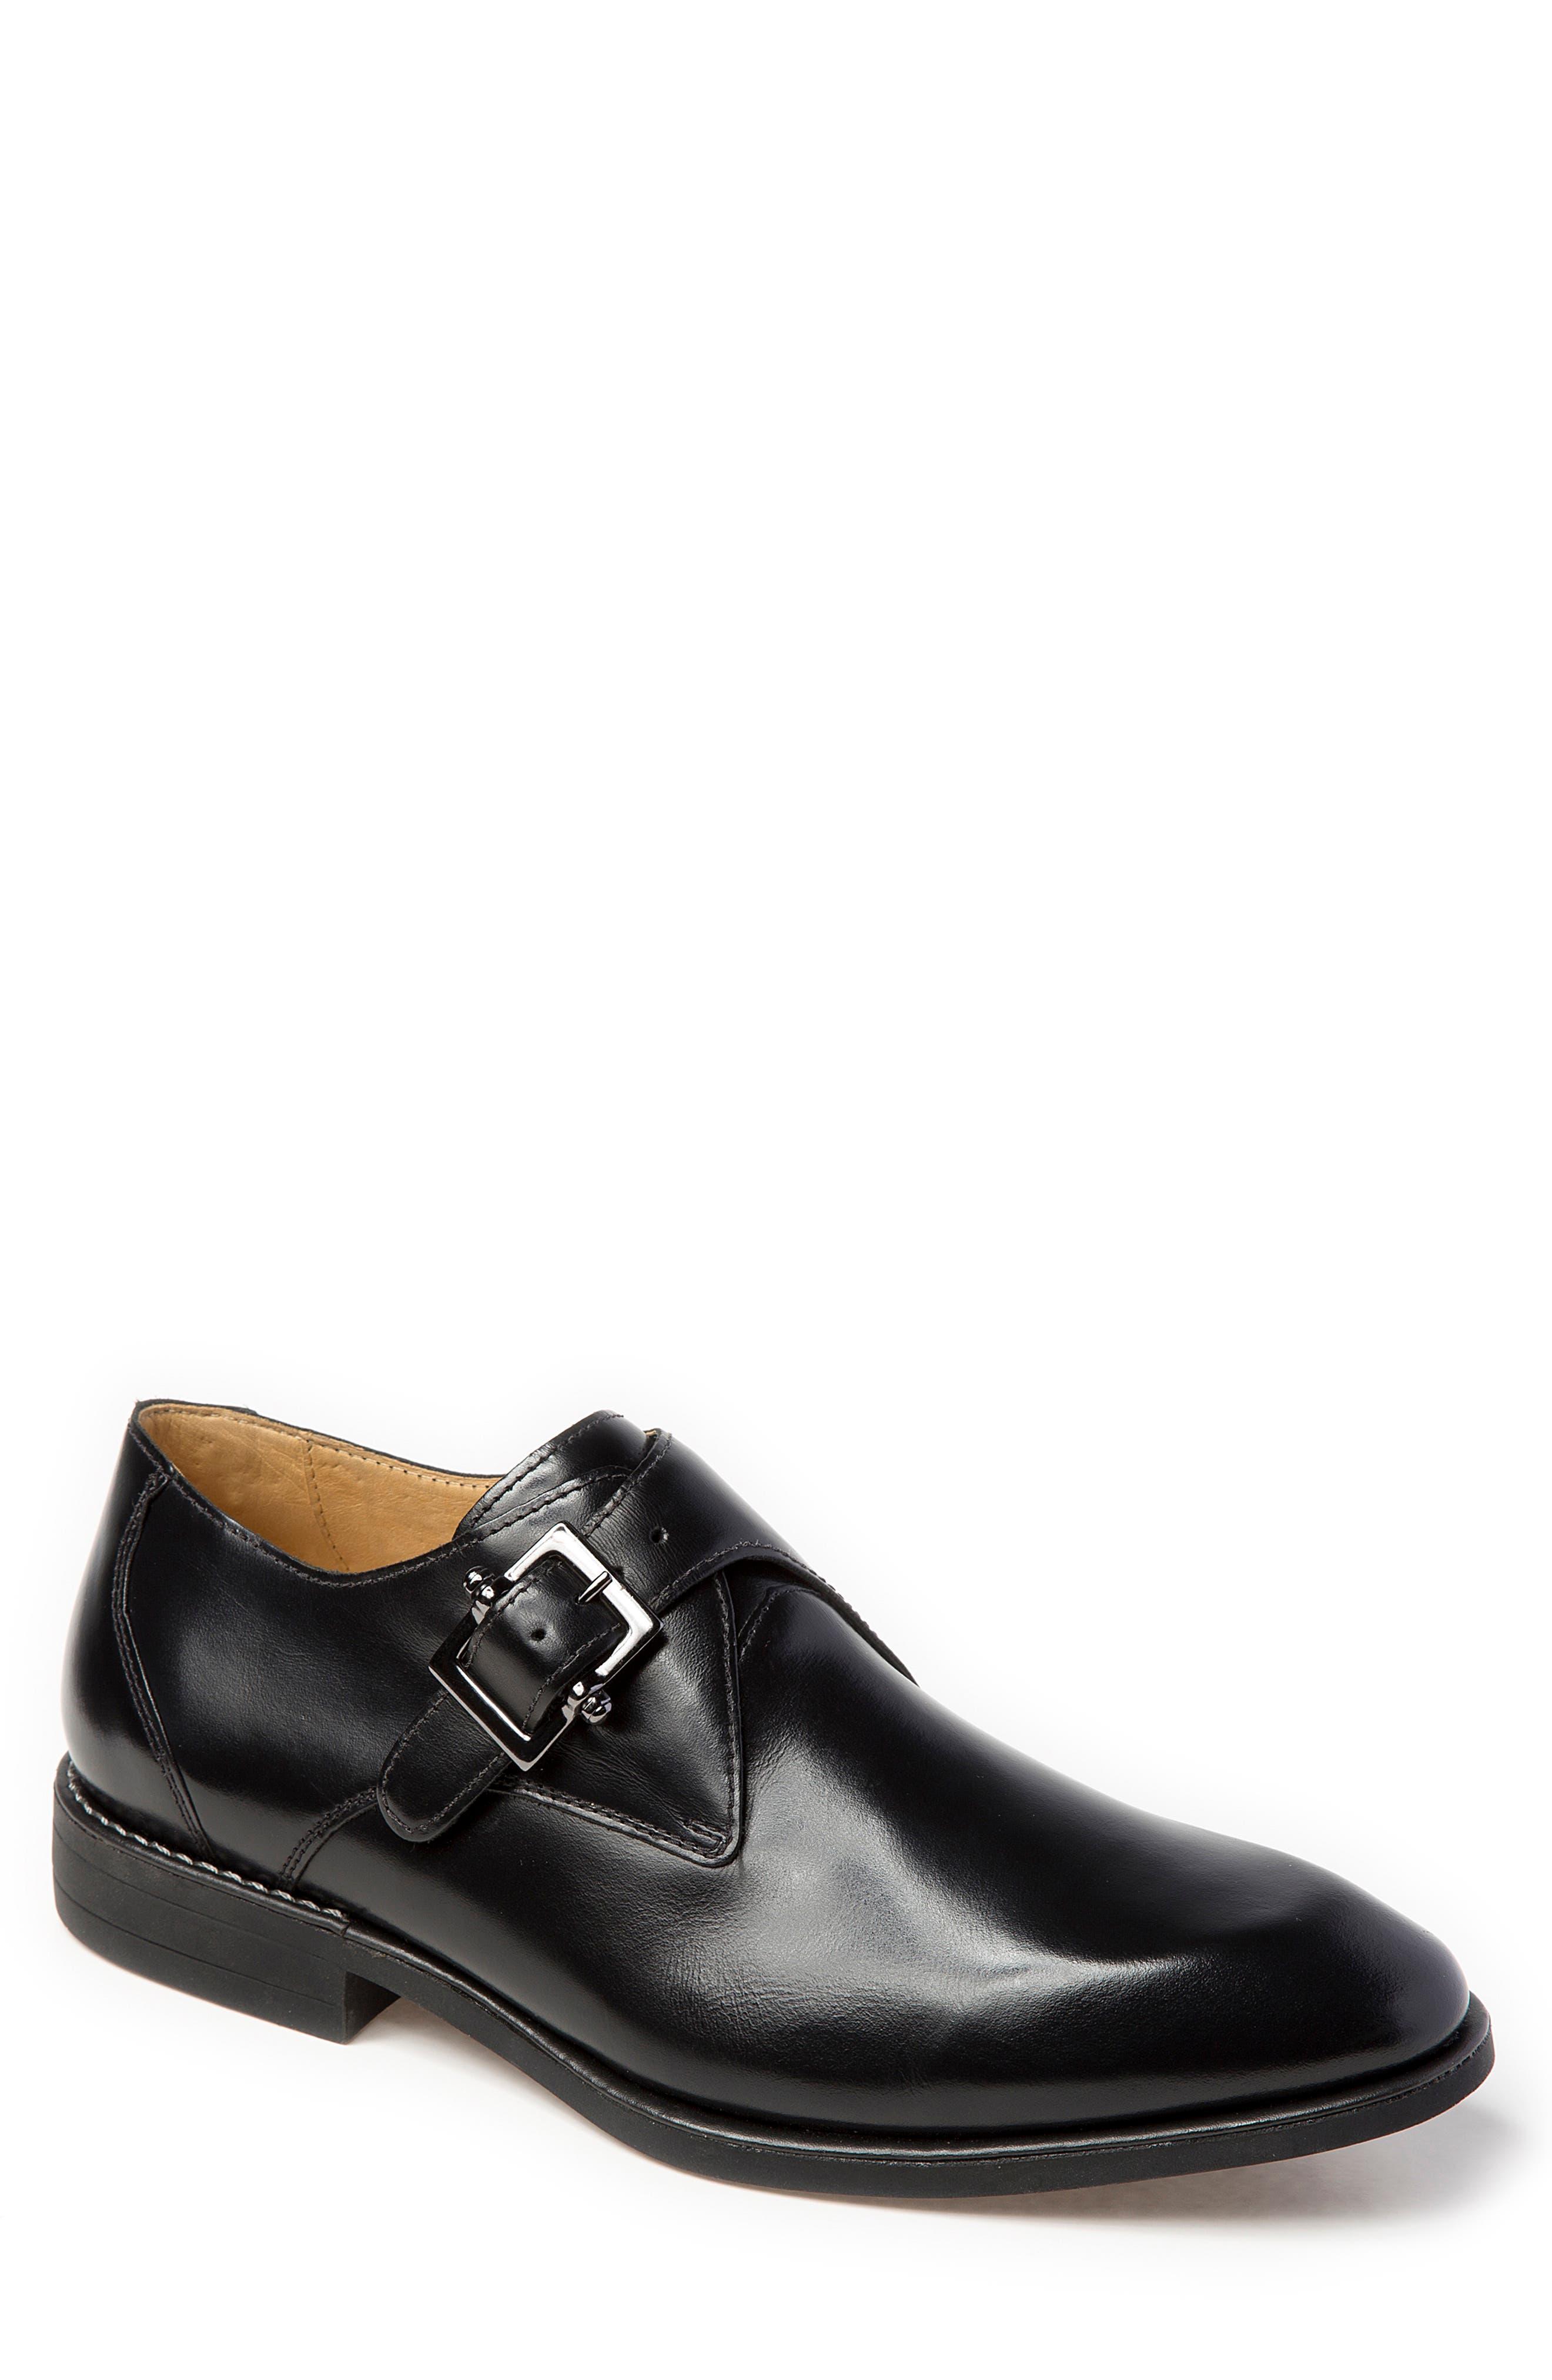 Wendell Single Buckle Monk Shoe,                             Main thumbnail 1, color,                             BLACK LEATHER